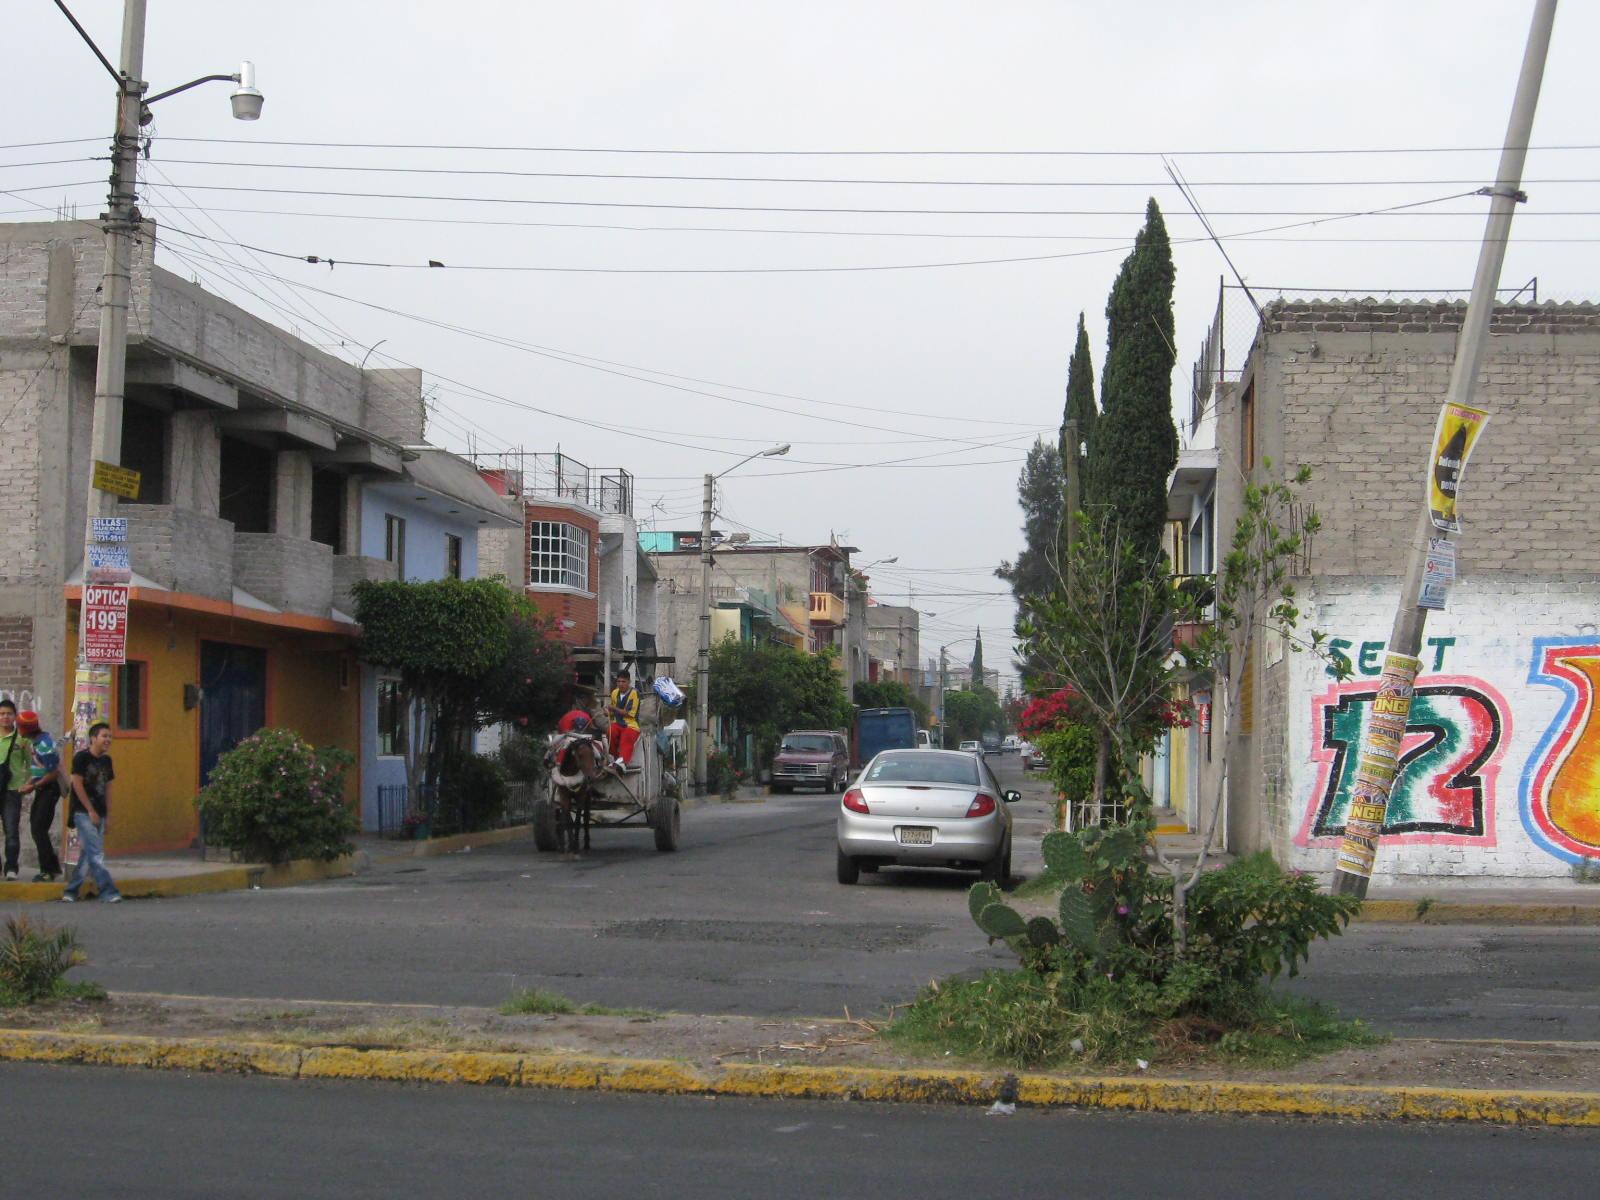 Ciudad Nezahualcoyotl Mapa Ciudad Nezahualcoyotl Mexico